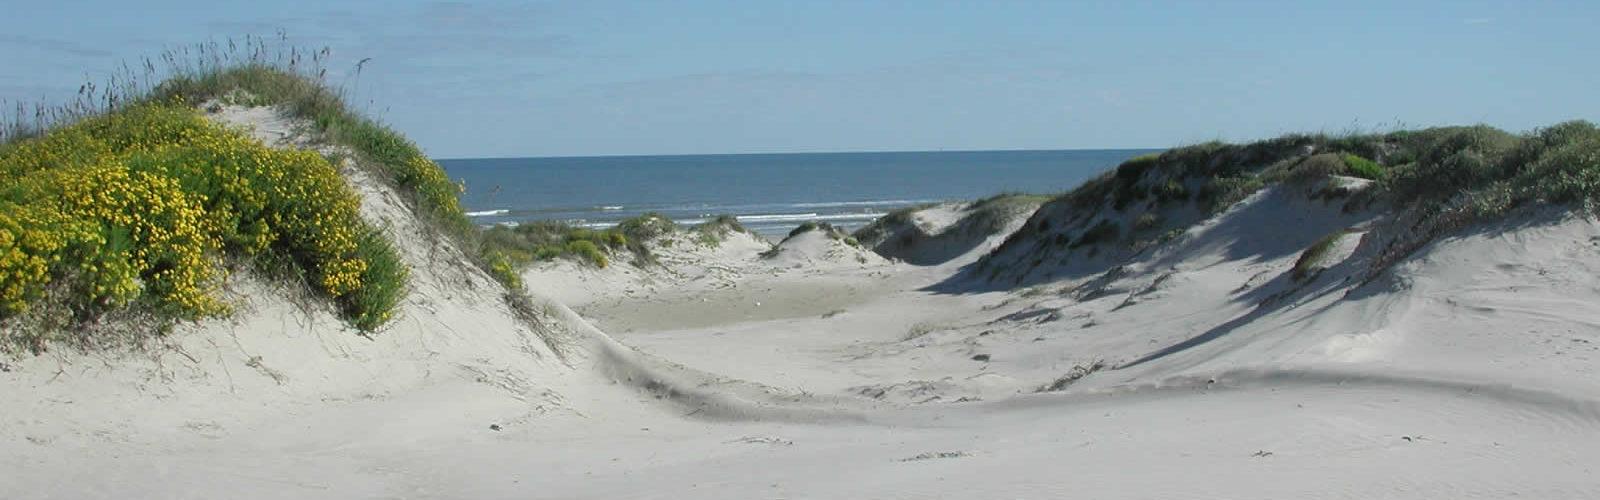 visiter-south-padre-island-vacances-peche-plage-tortues-une